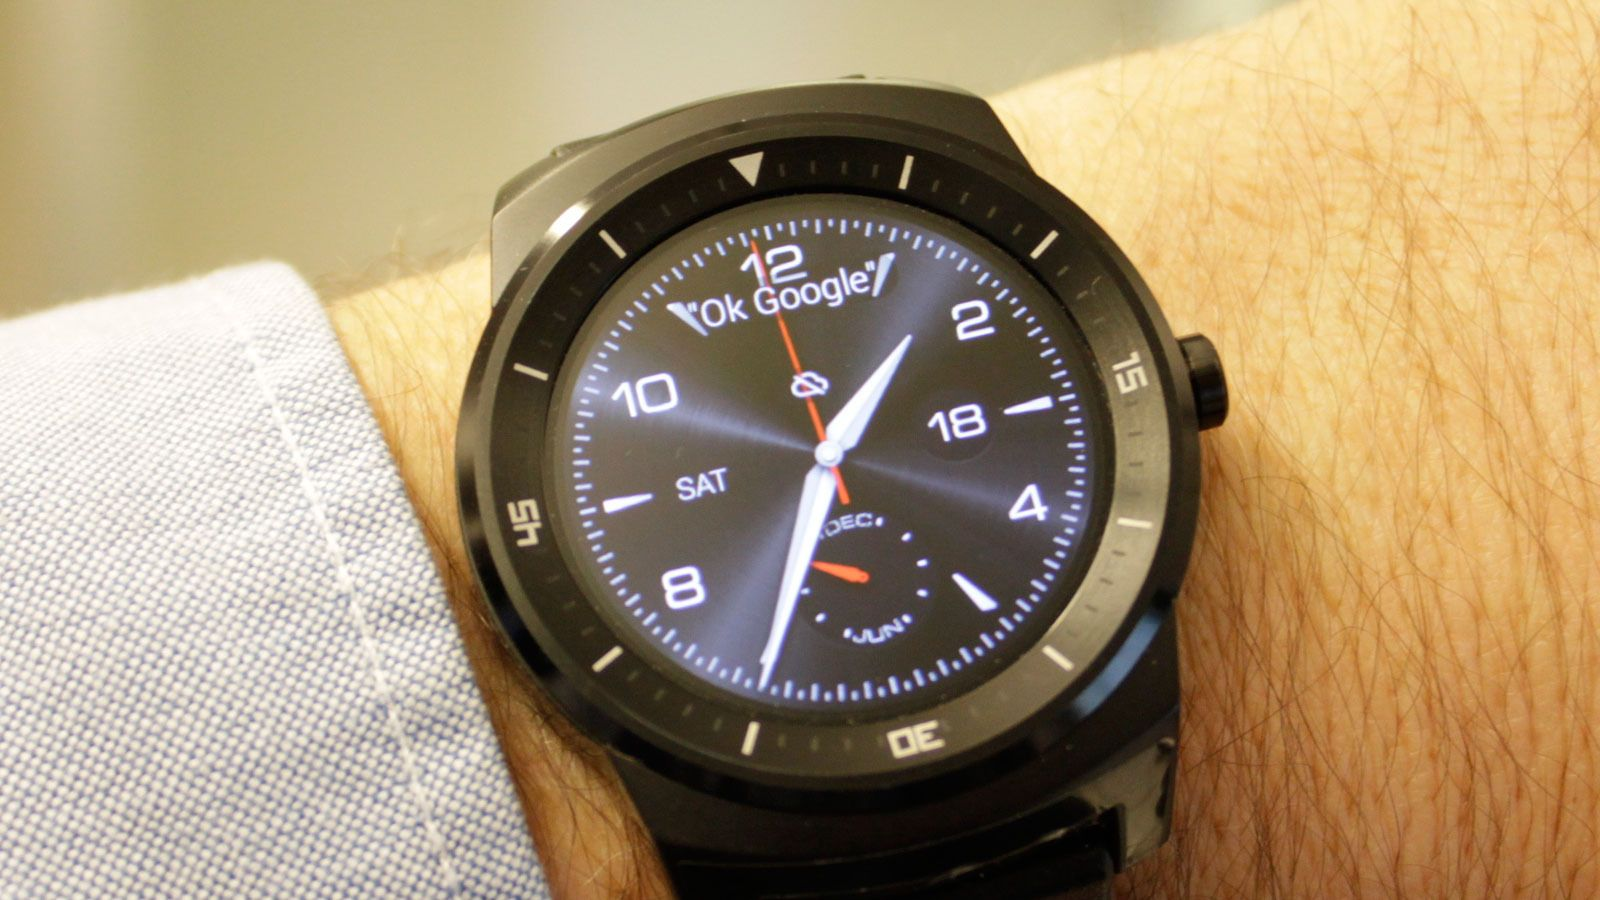 LG G Watch R.Foto: Espen Irwing Swang, Tek.no